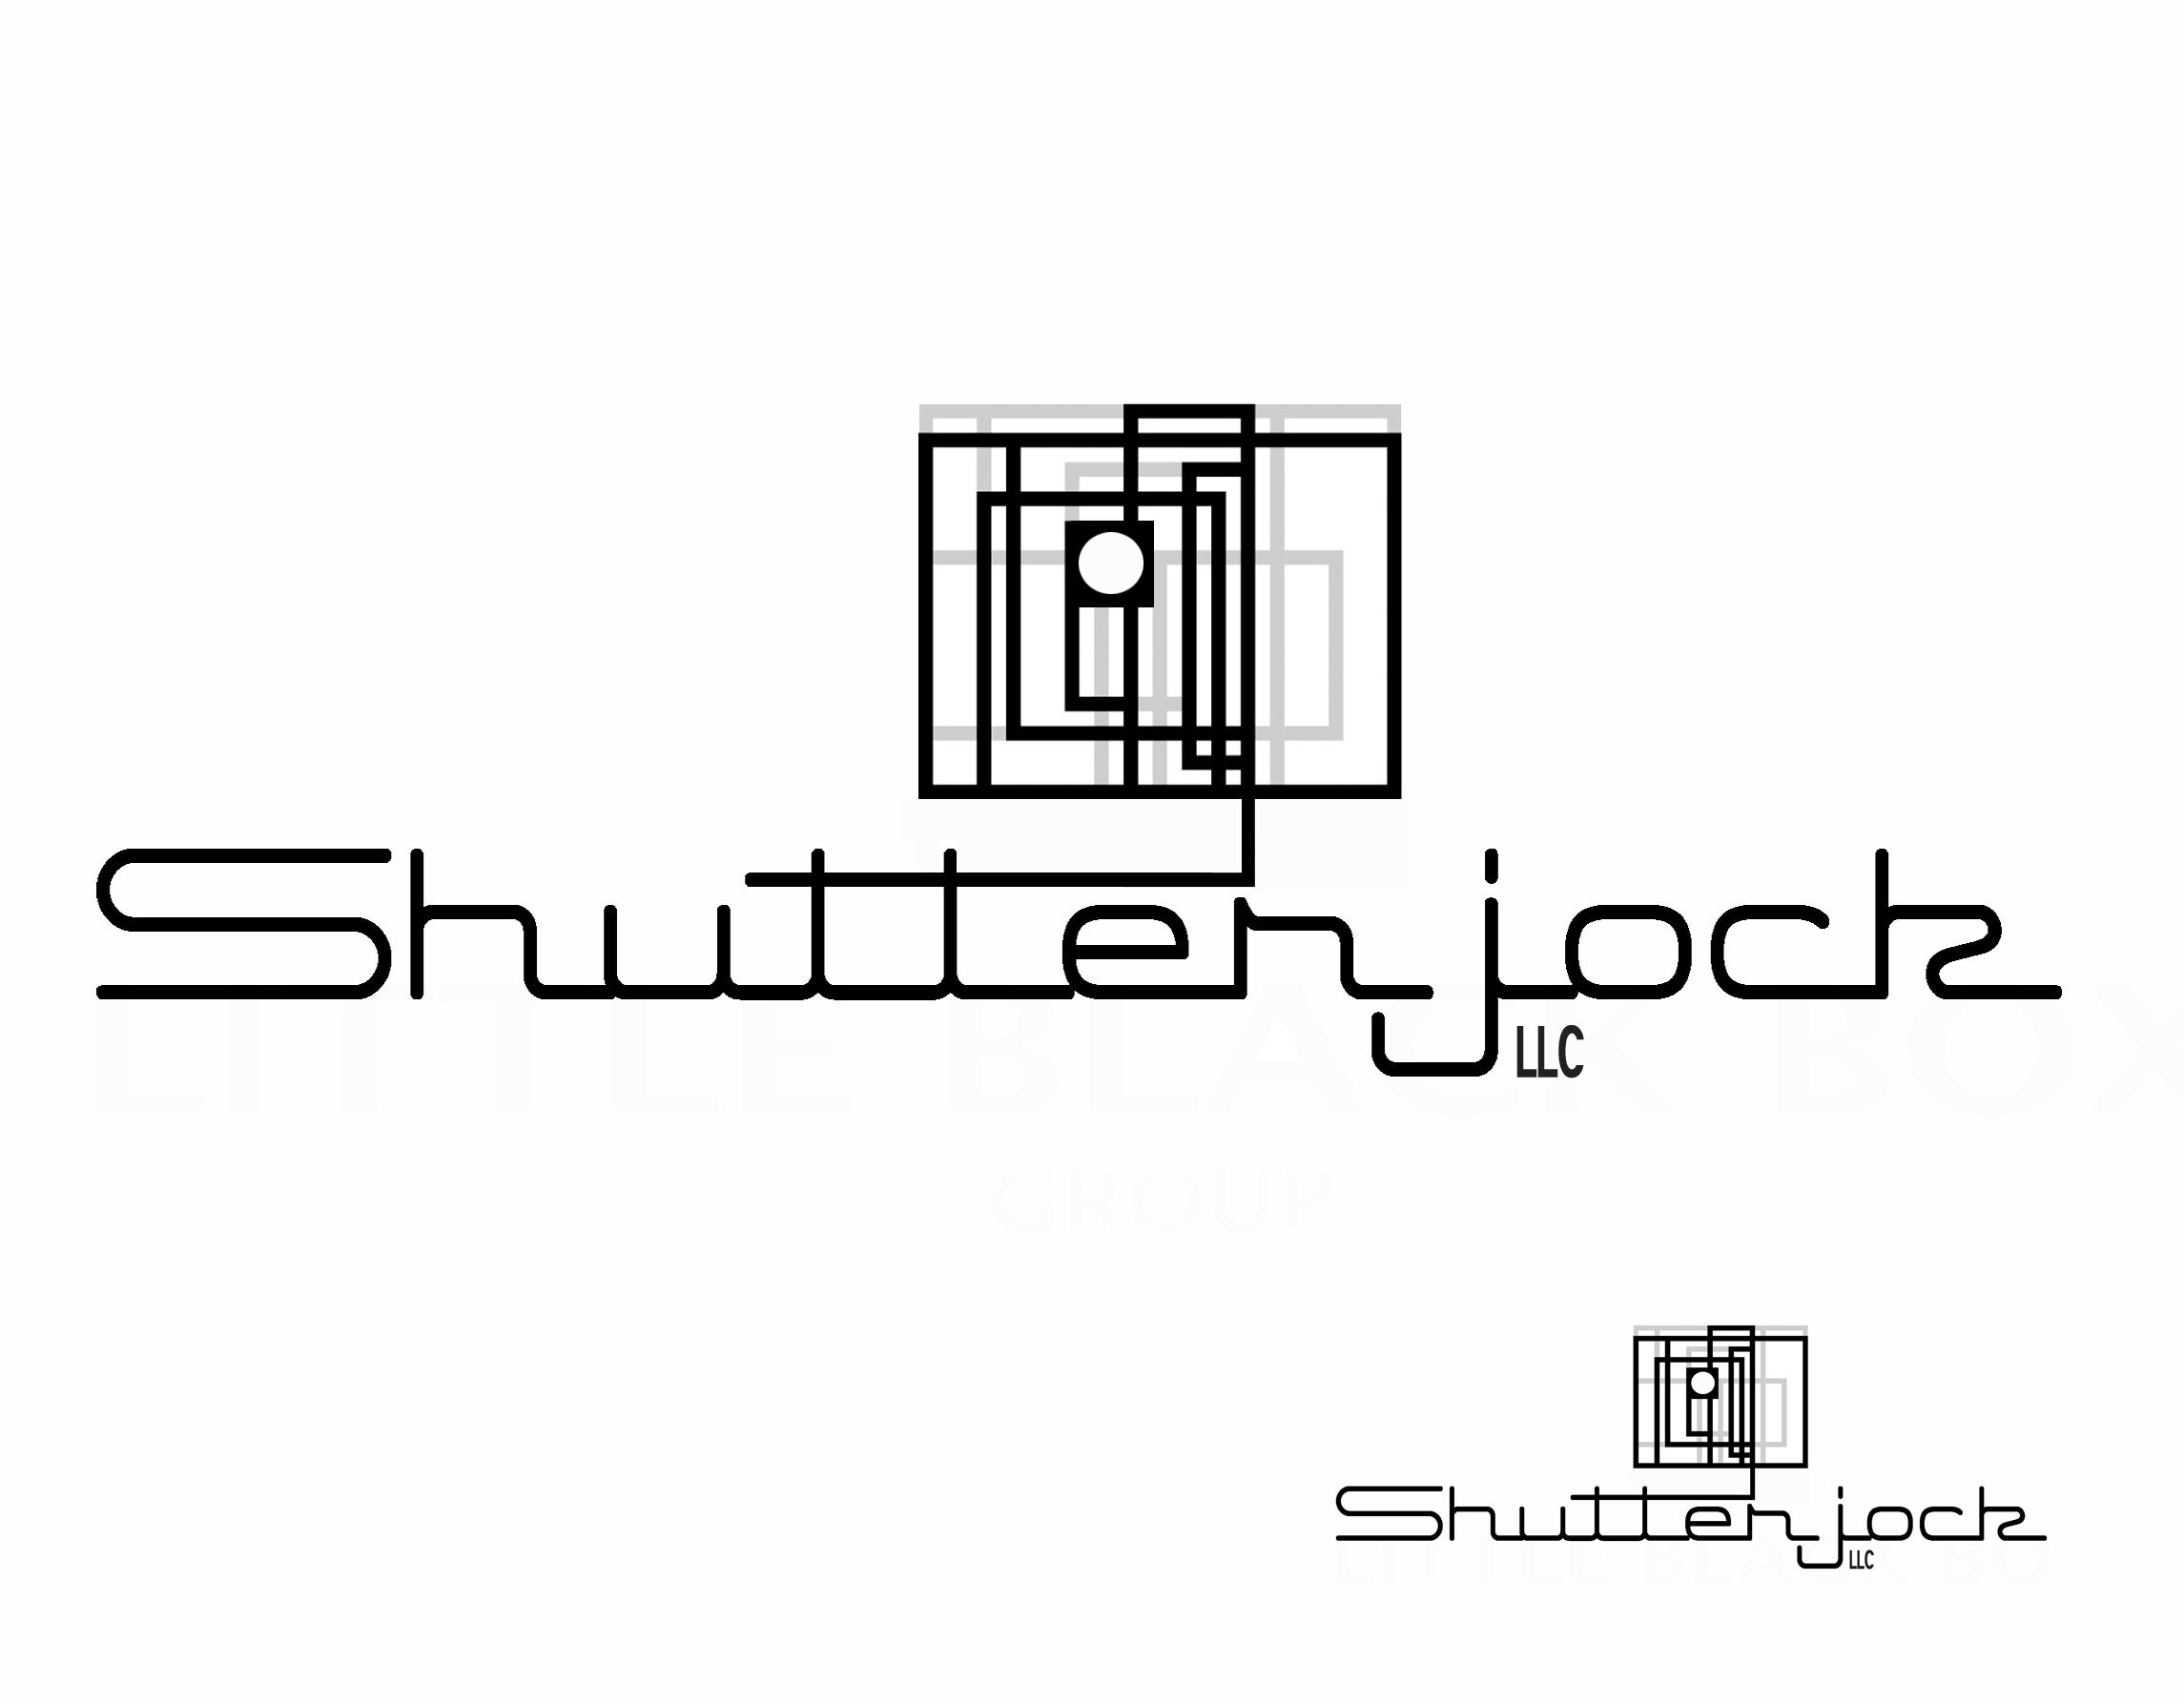 Logo Design by Steve Hunt - Entry No. 34 in the Logo Design Contest Unique Logo Design Wanted for Shutterjock LLC.